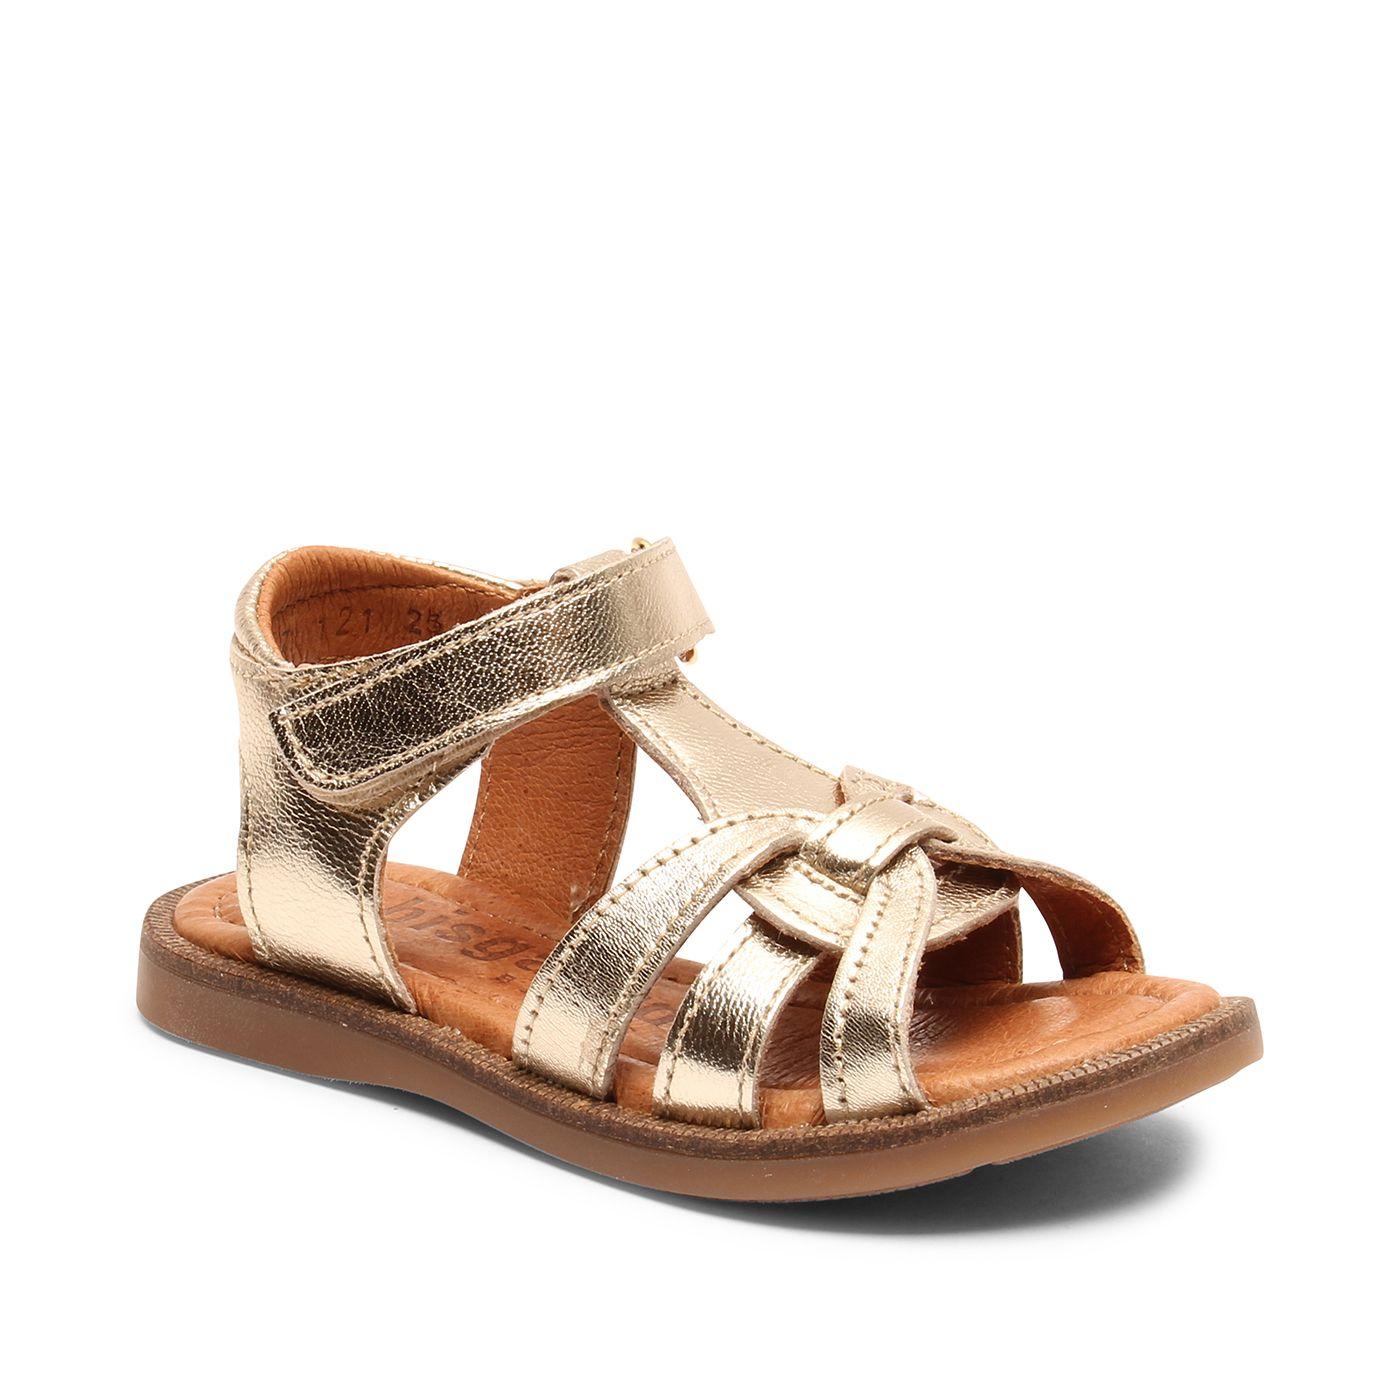 Bisgaard dívčí kožené sandály 70707 - 2212